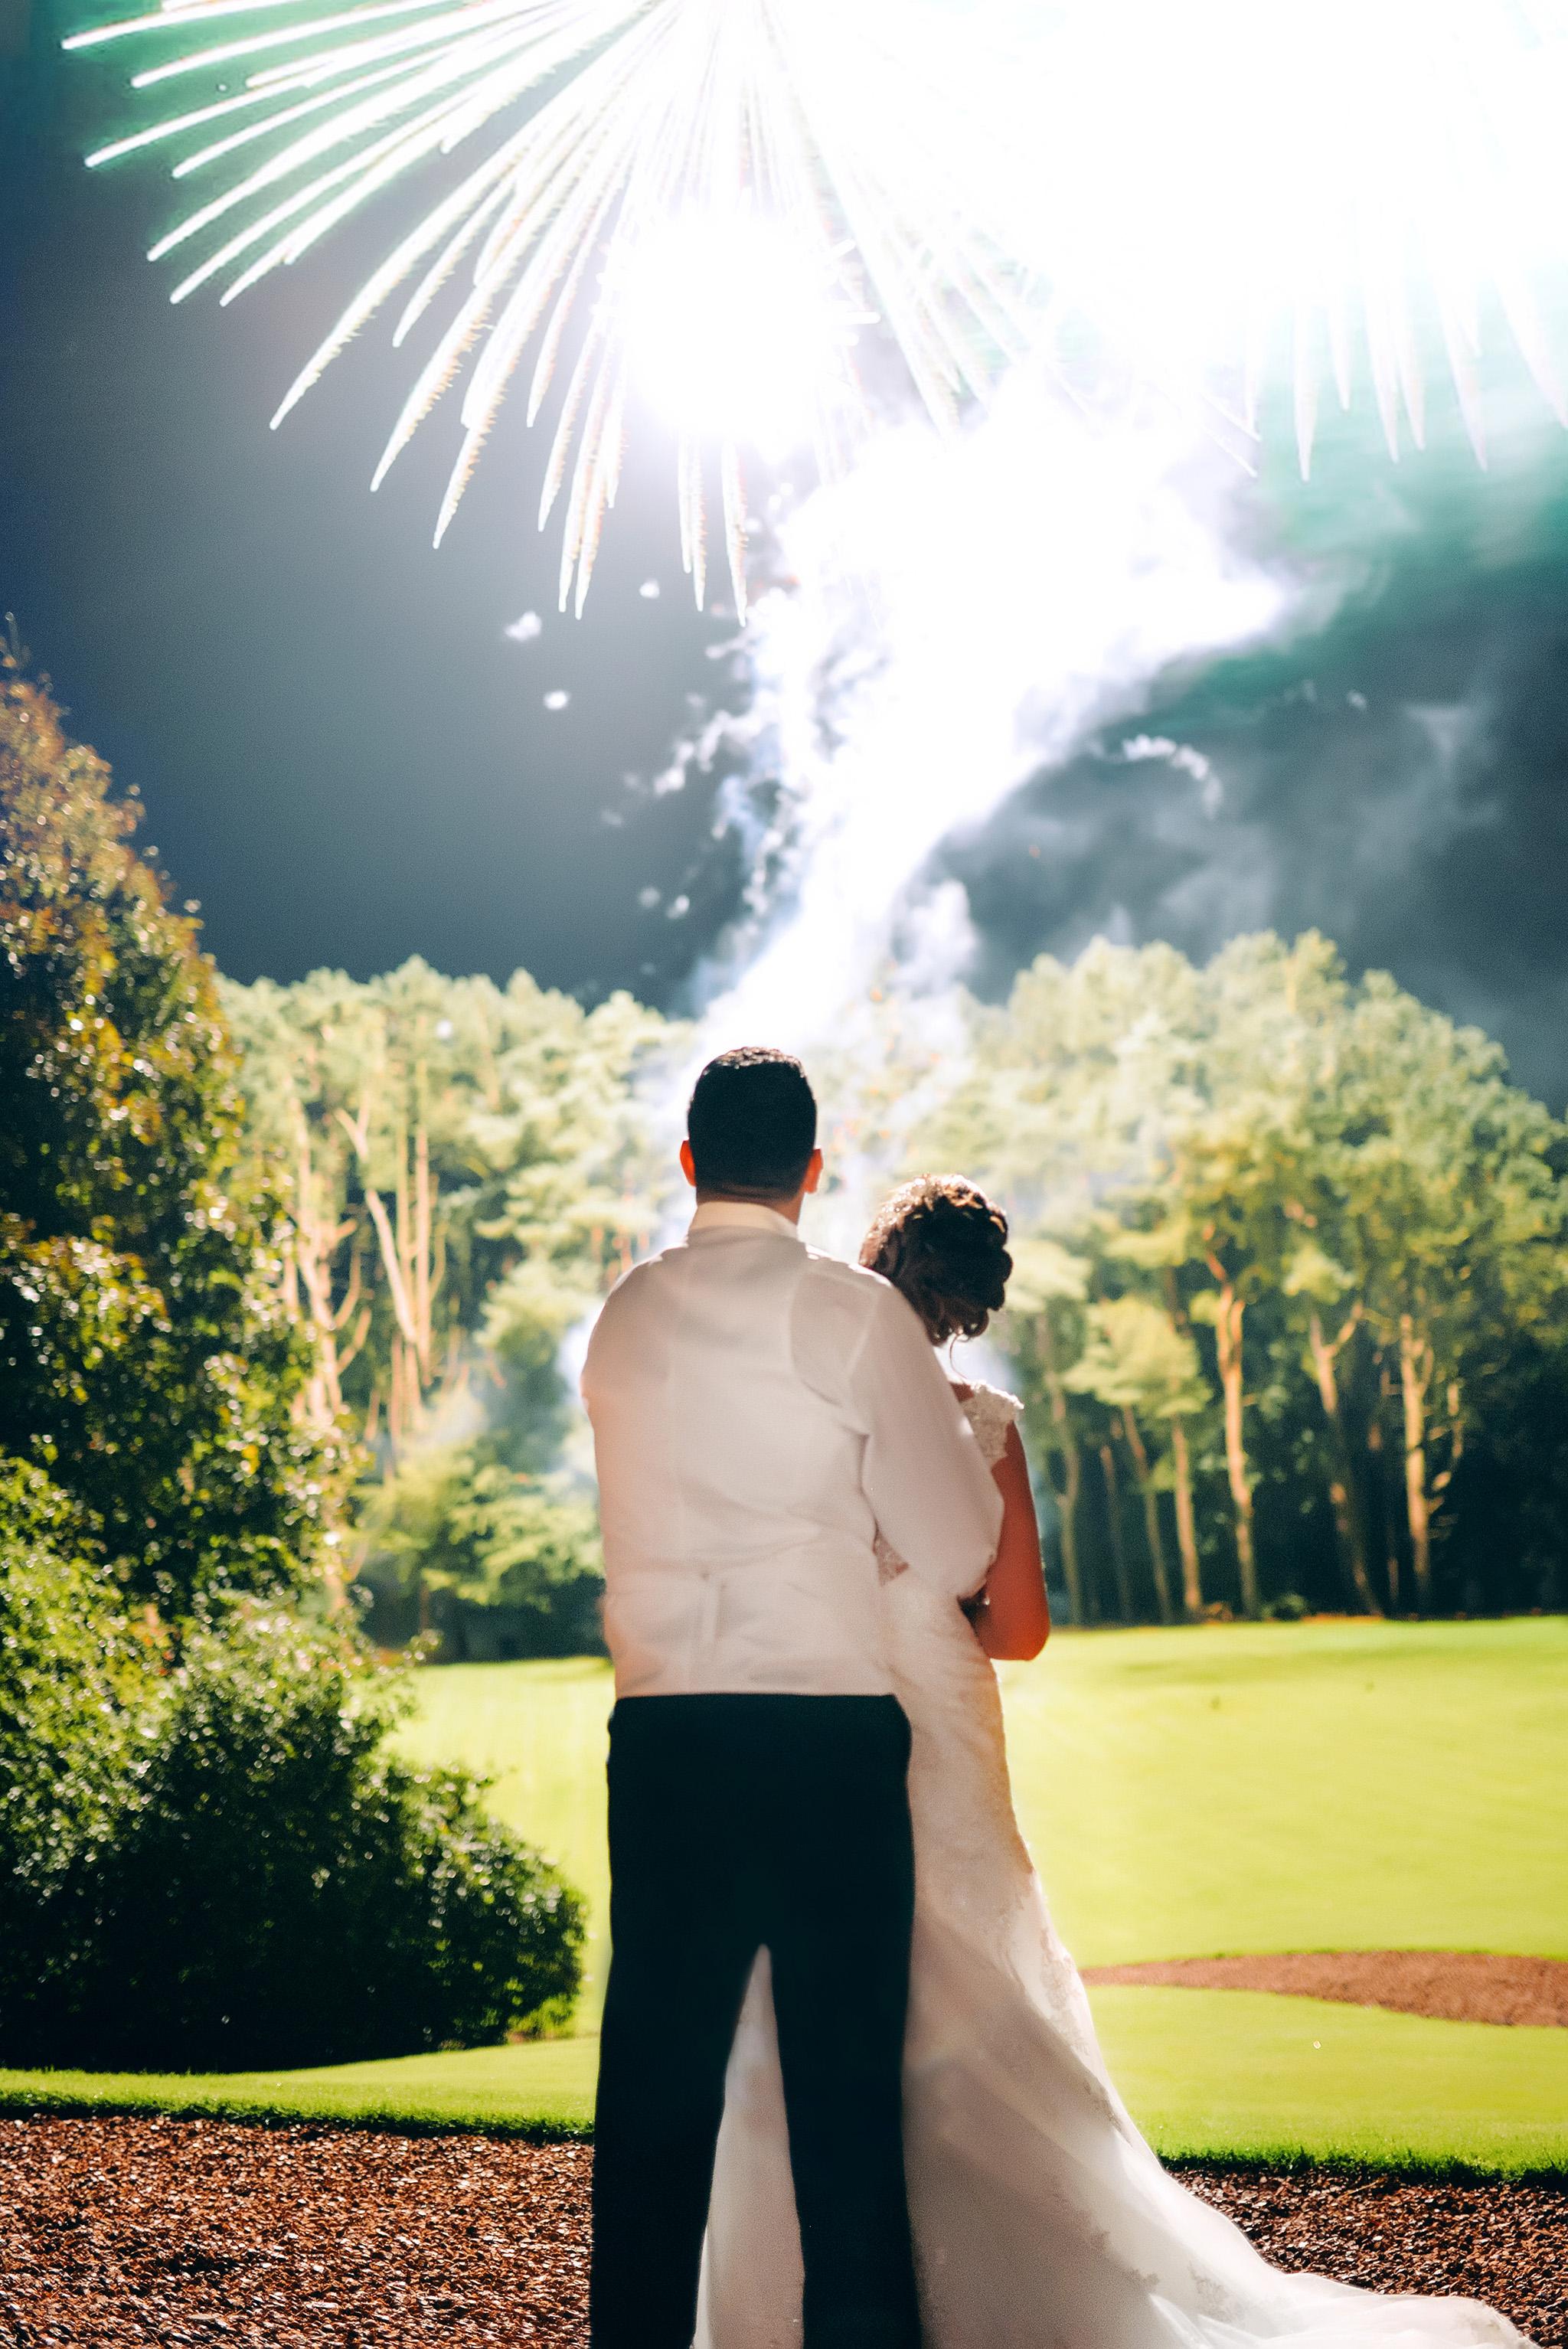 Wedding couple watching fireworks